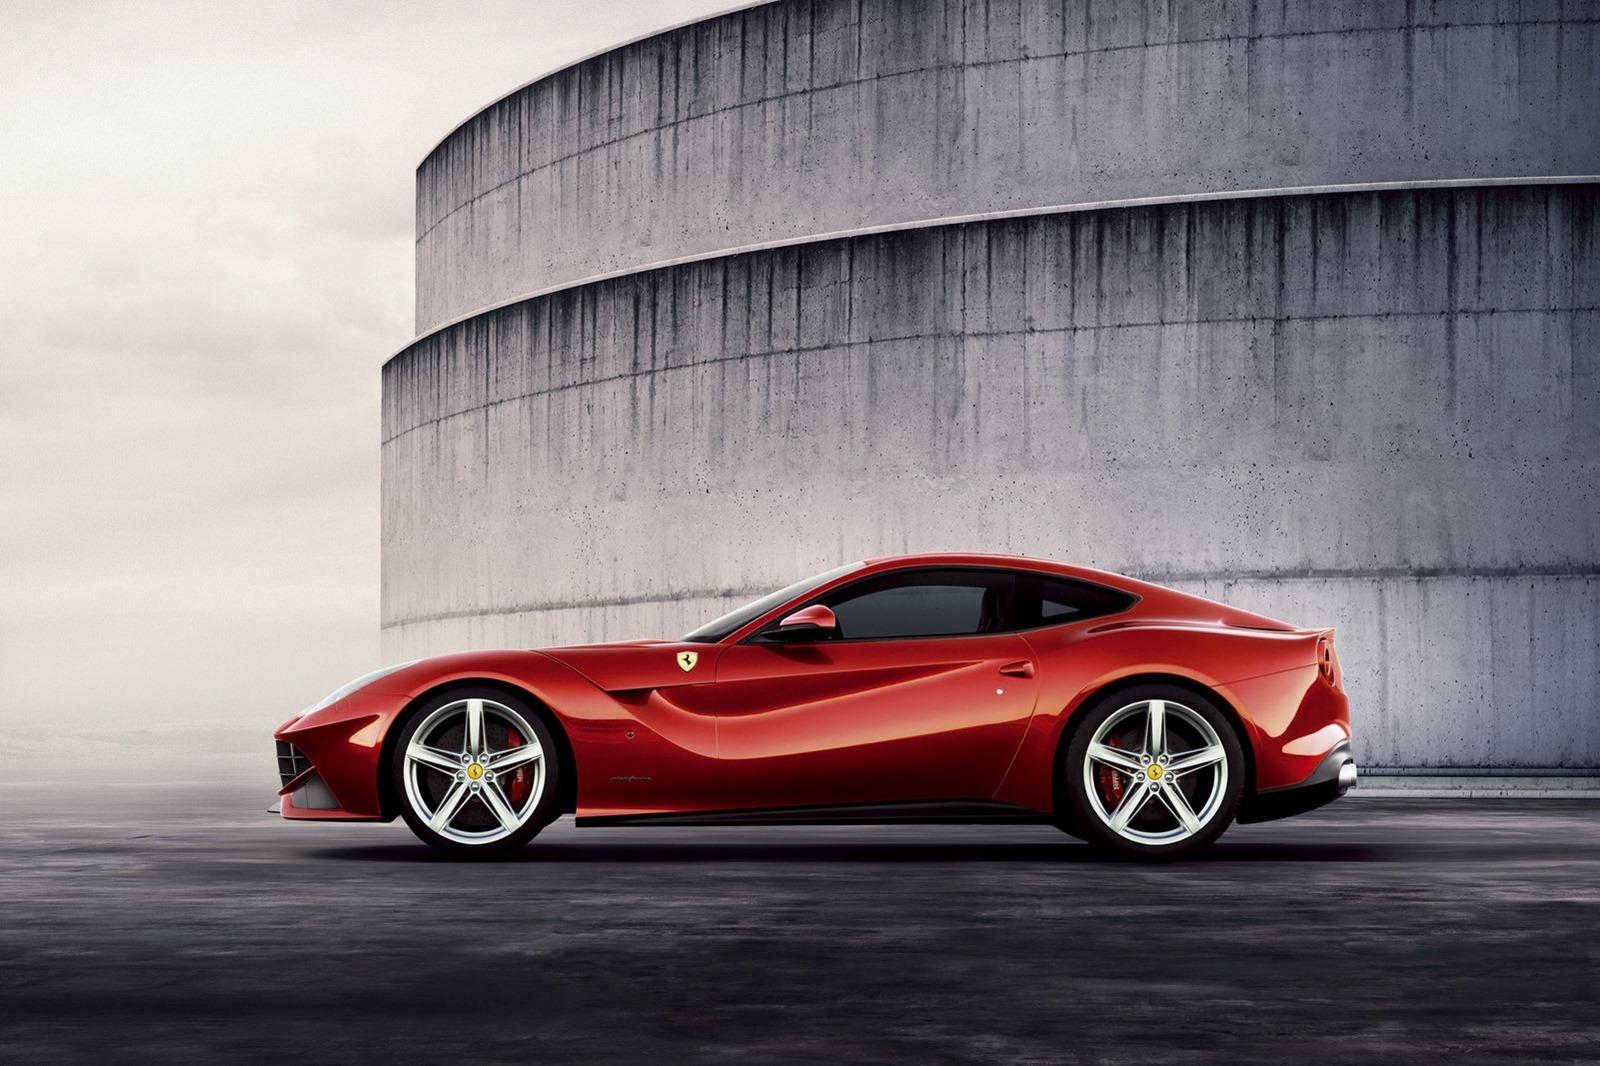 Ferrari F12 Berlientta